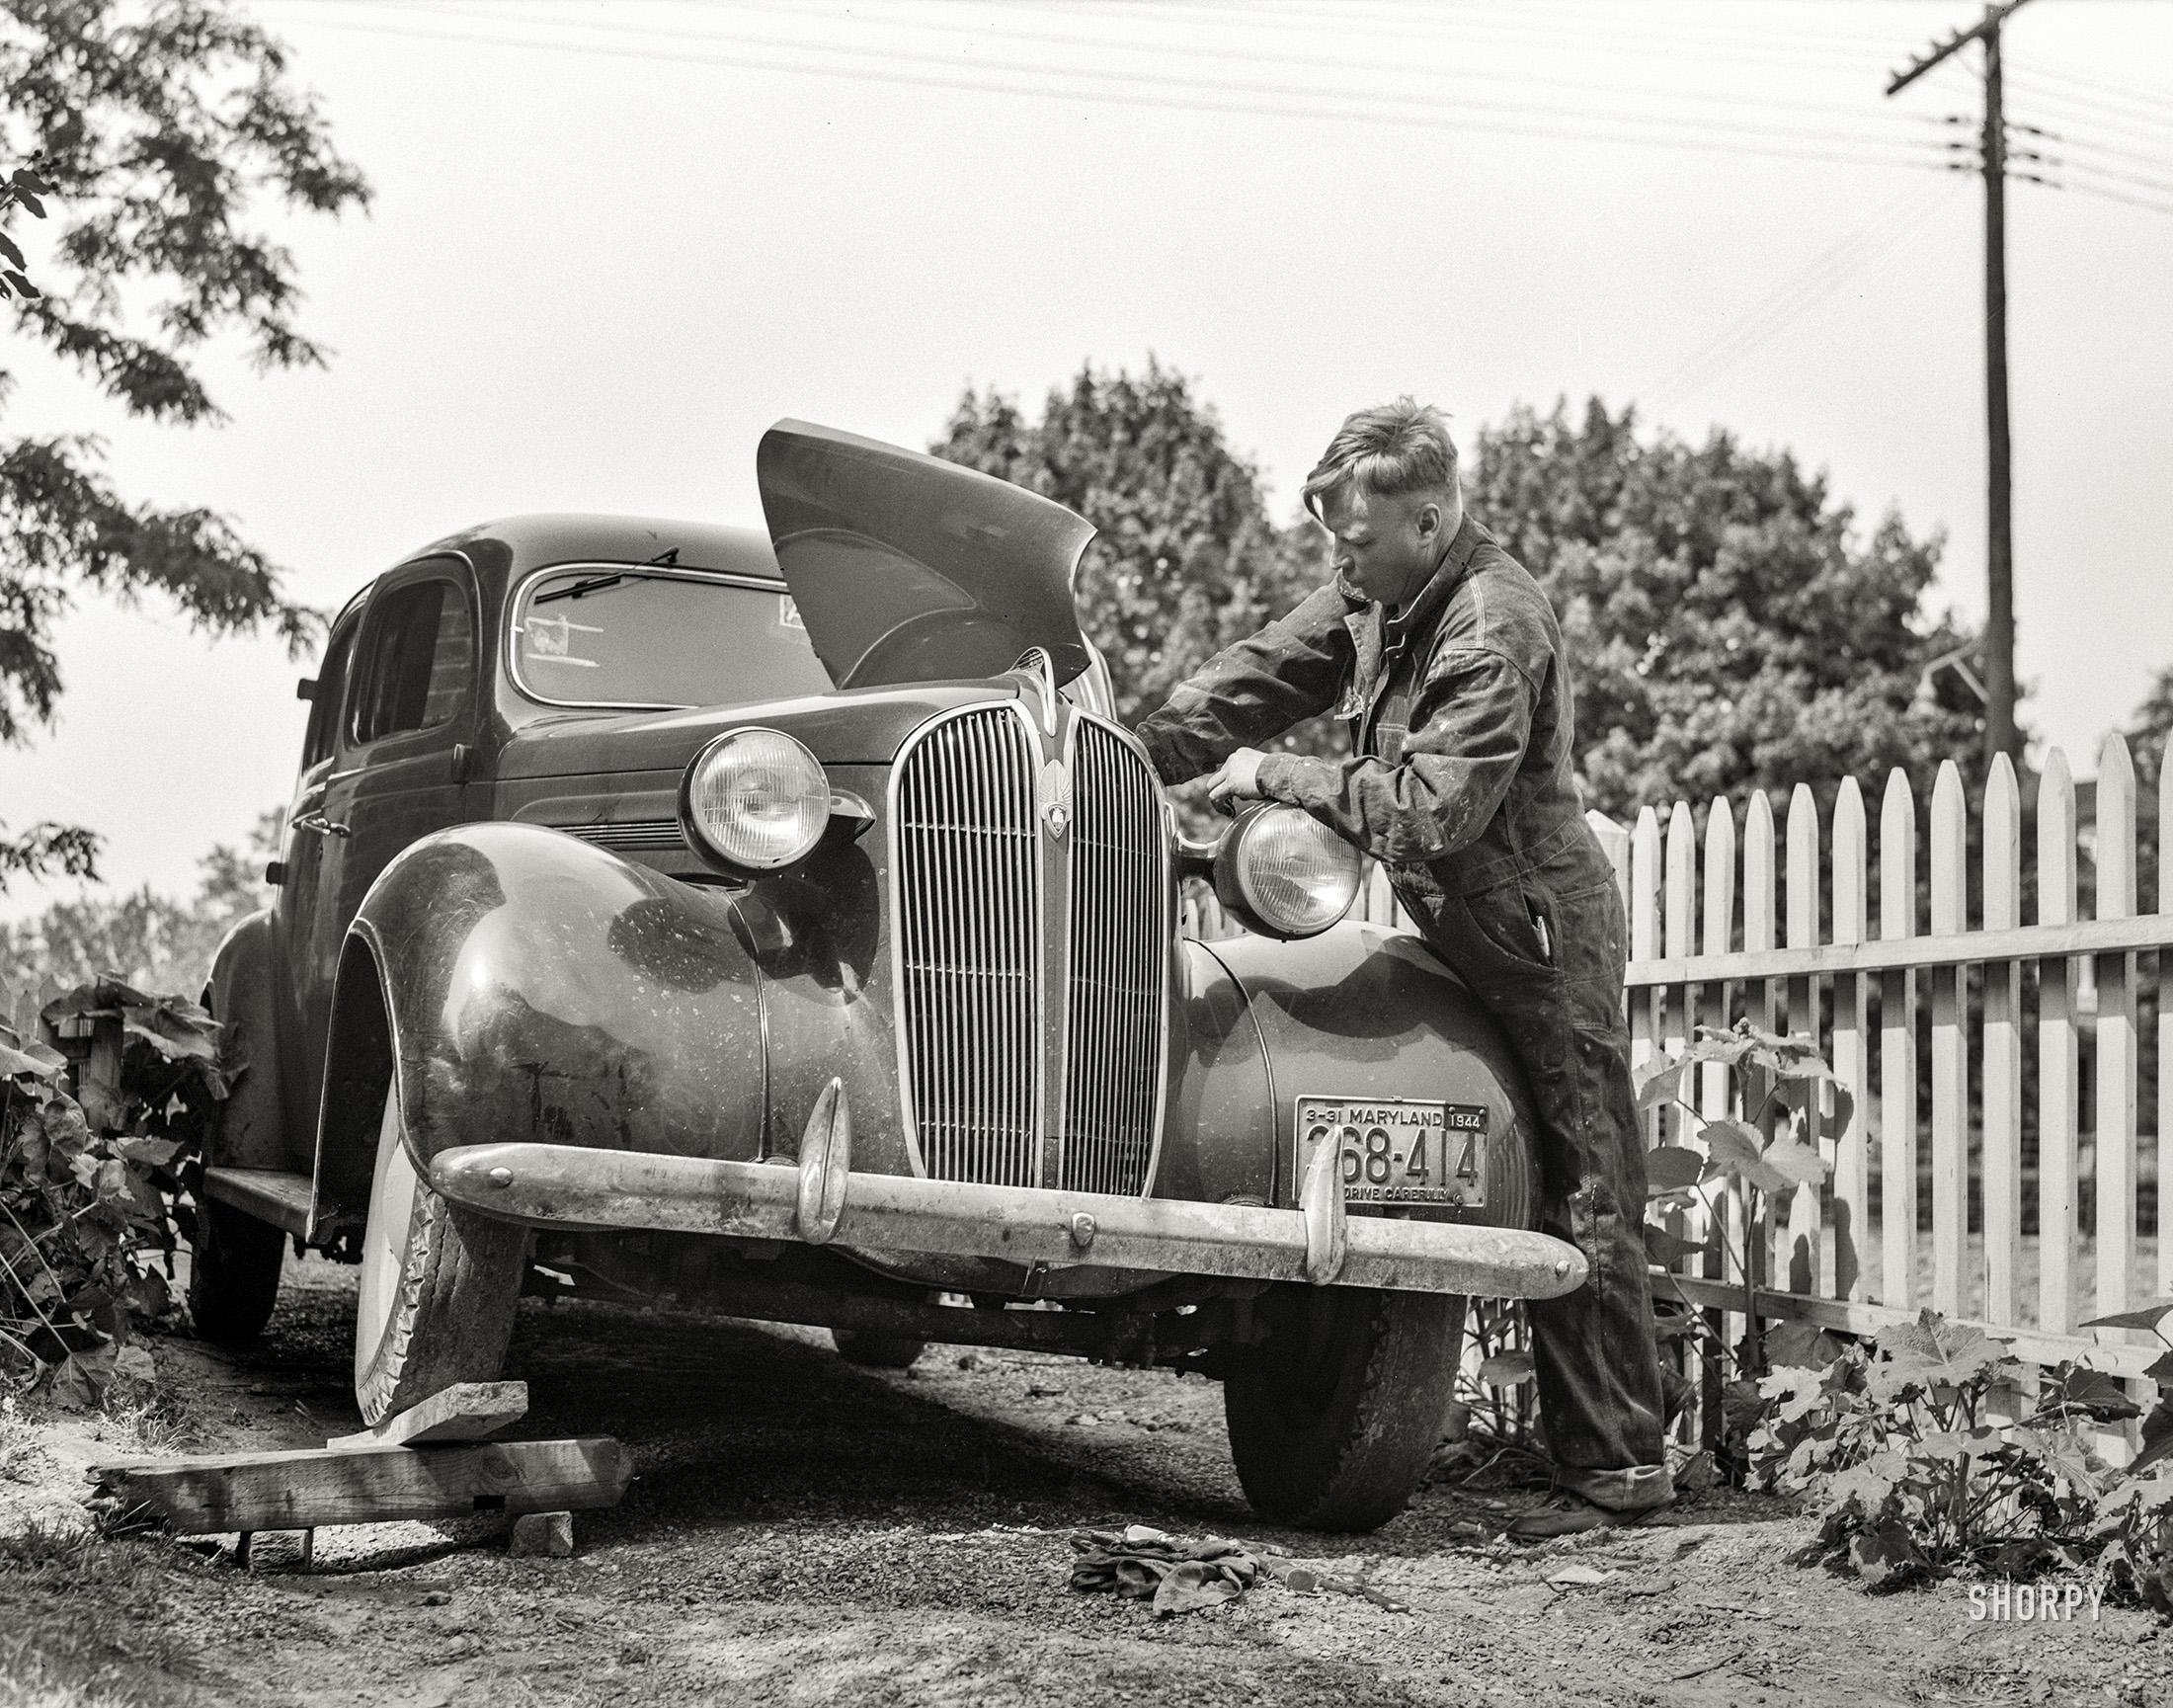 Backyard Mechanic: 1943 | Shorpy | #1 Old Photos